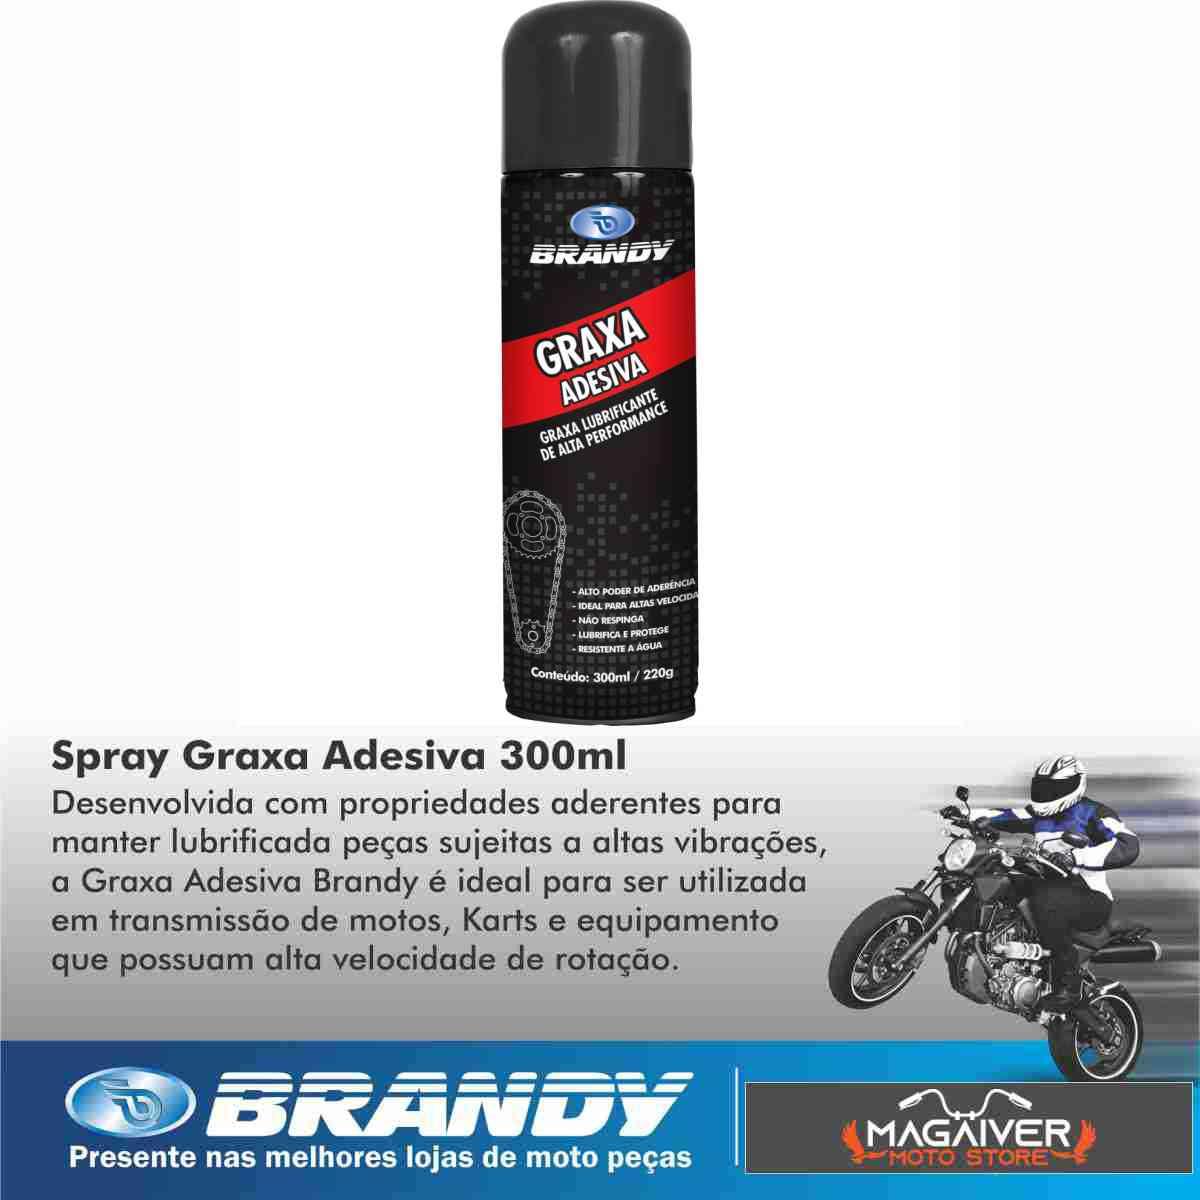 KIT 1 GRAXA ADESIVA MOTO BRANDY DE ALTA + 1 LIMPADOR CORRENTE E MOTOR 300ml + 1 REPARADOR PNEU 190ml